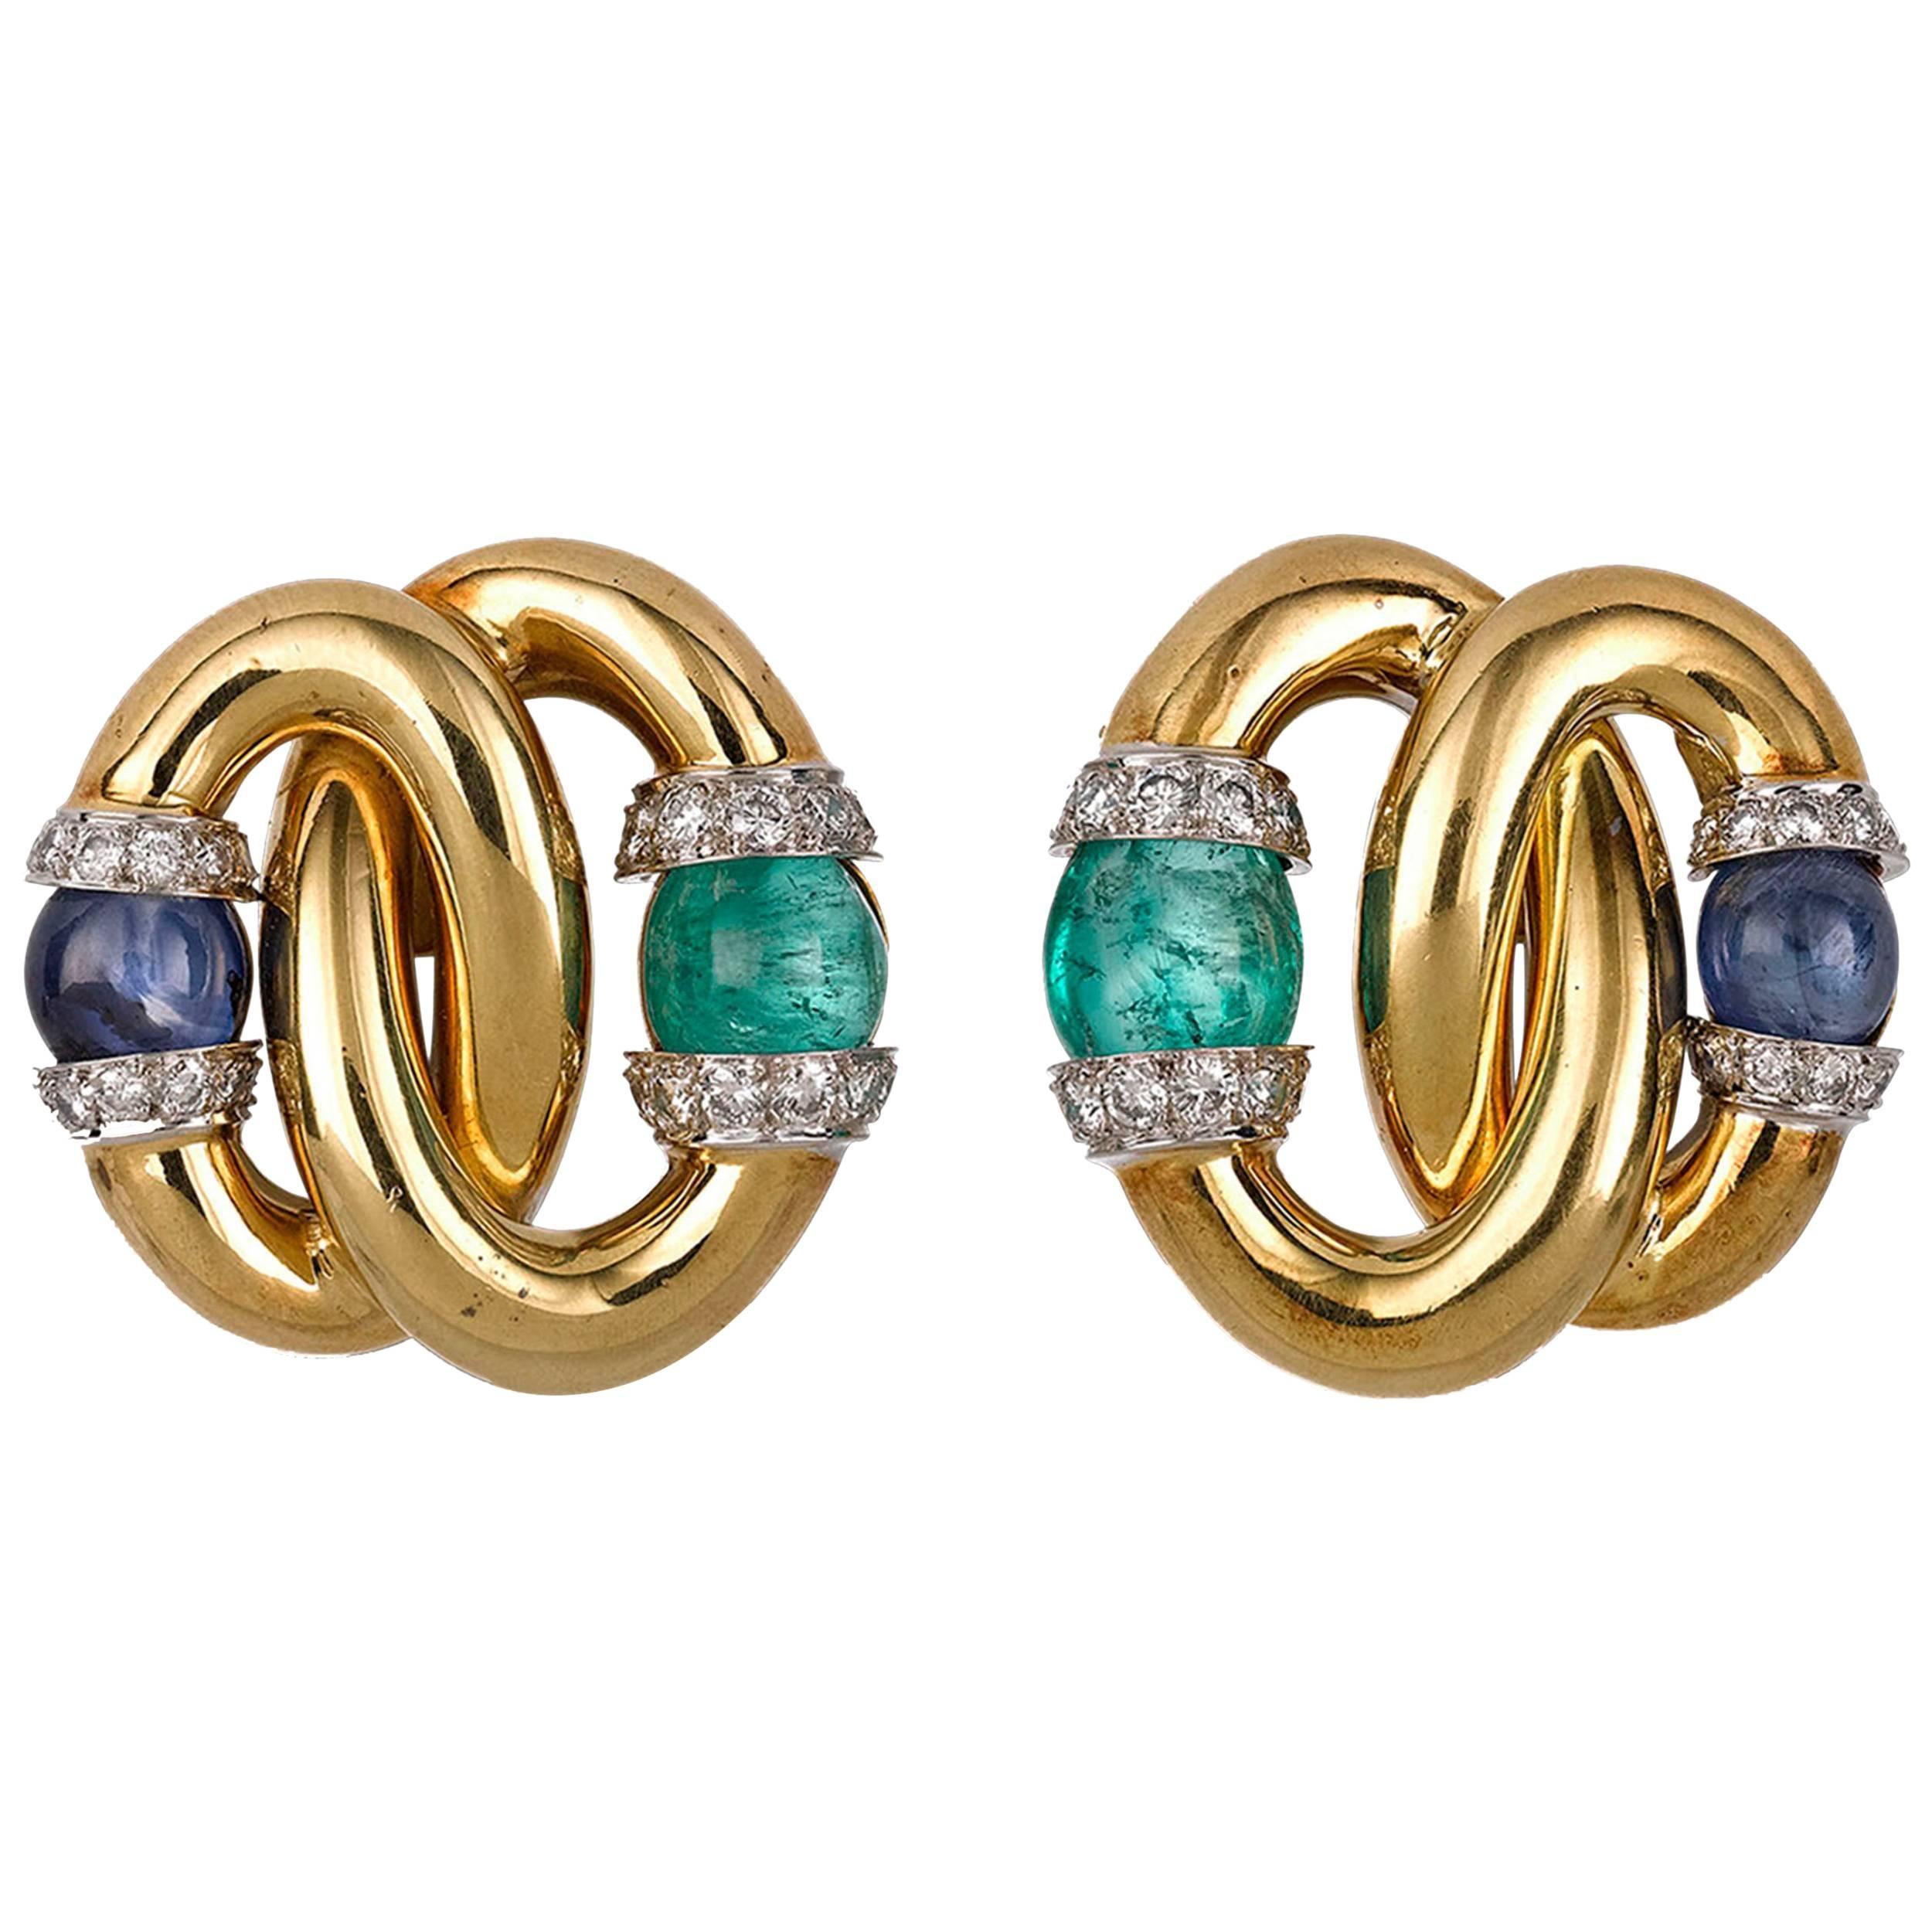 Diamond, Sapphire and Emerald Earrings by David Webb